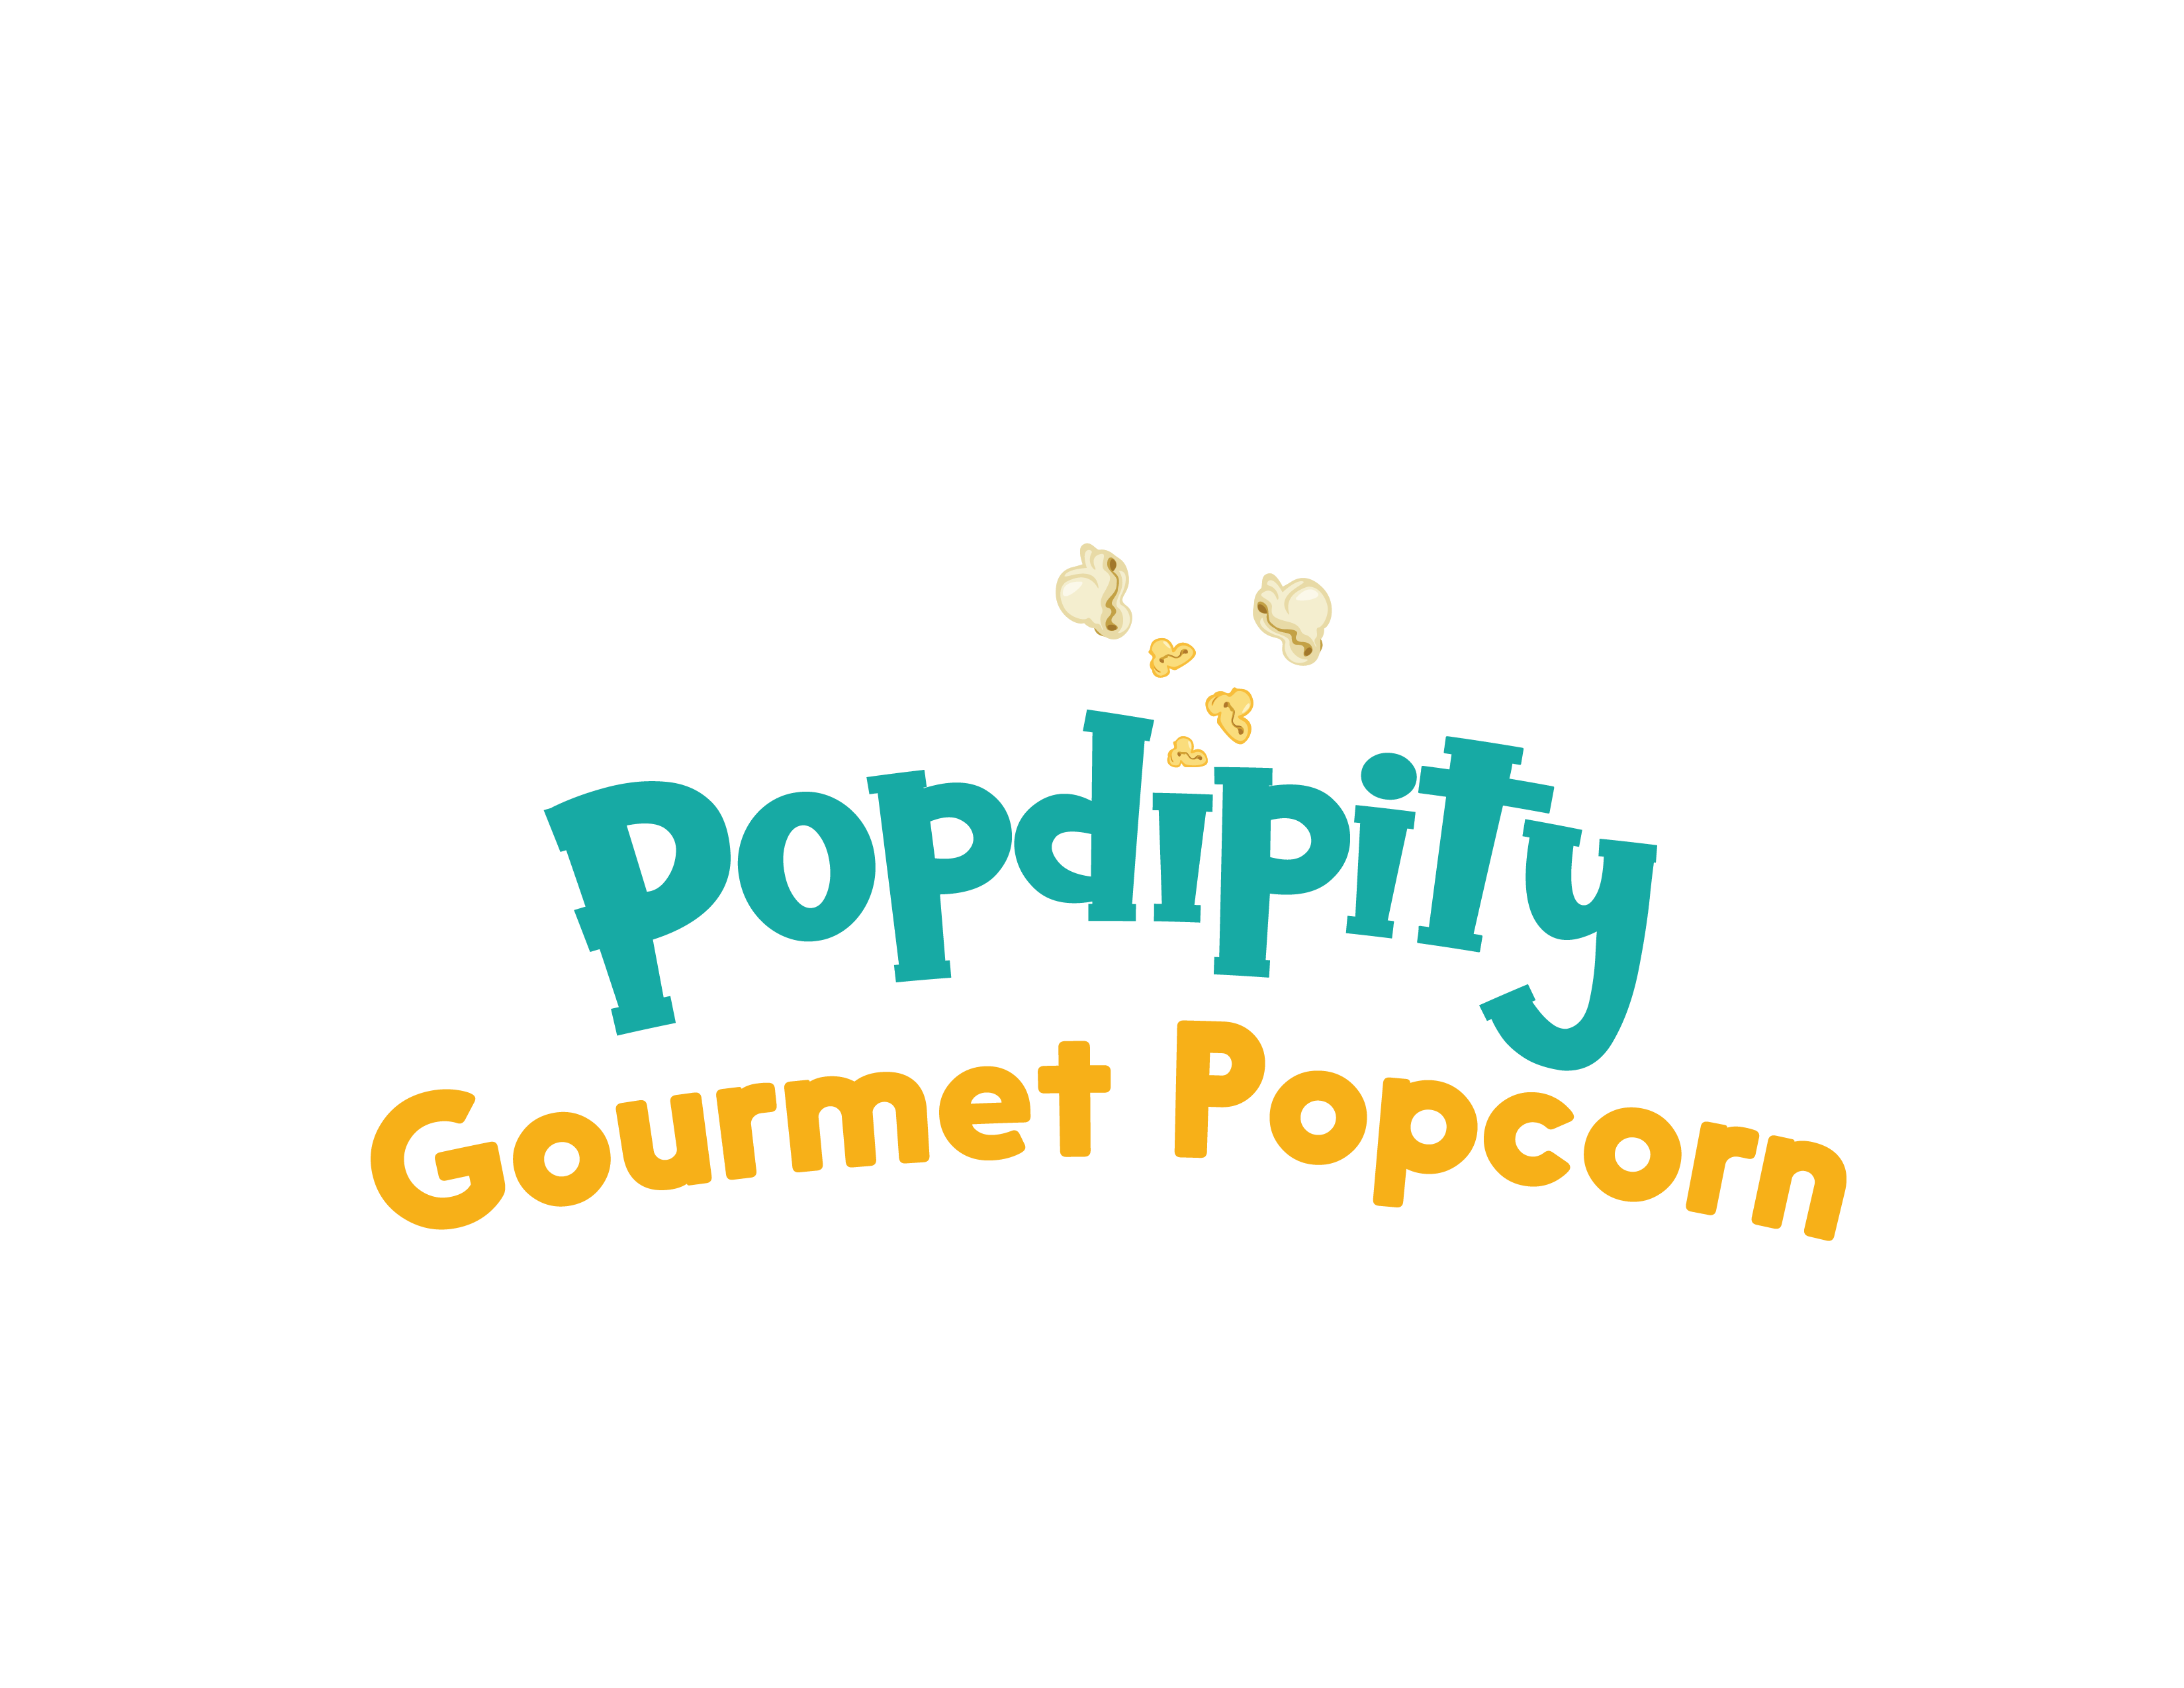 Popdipity Gourmet Popcorn Logo